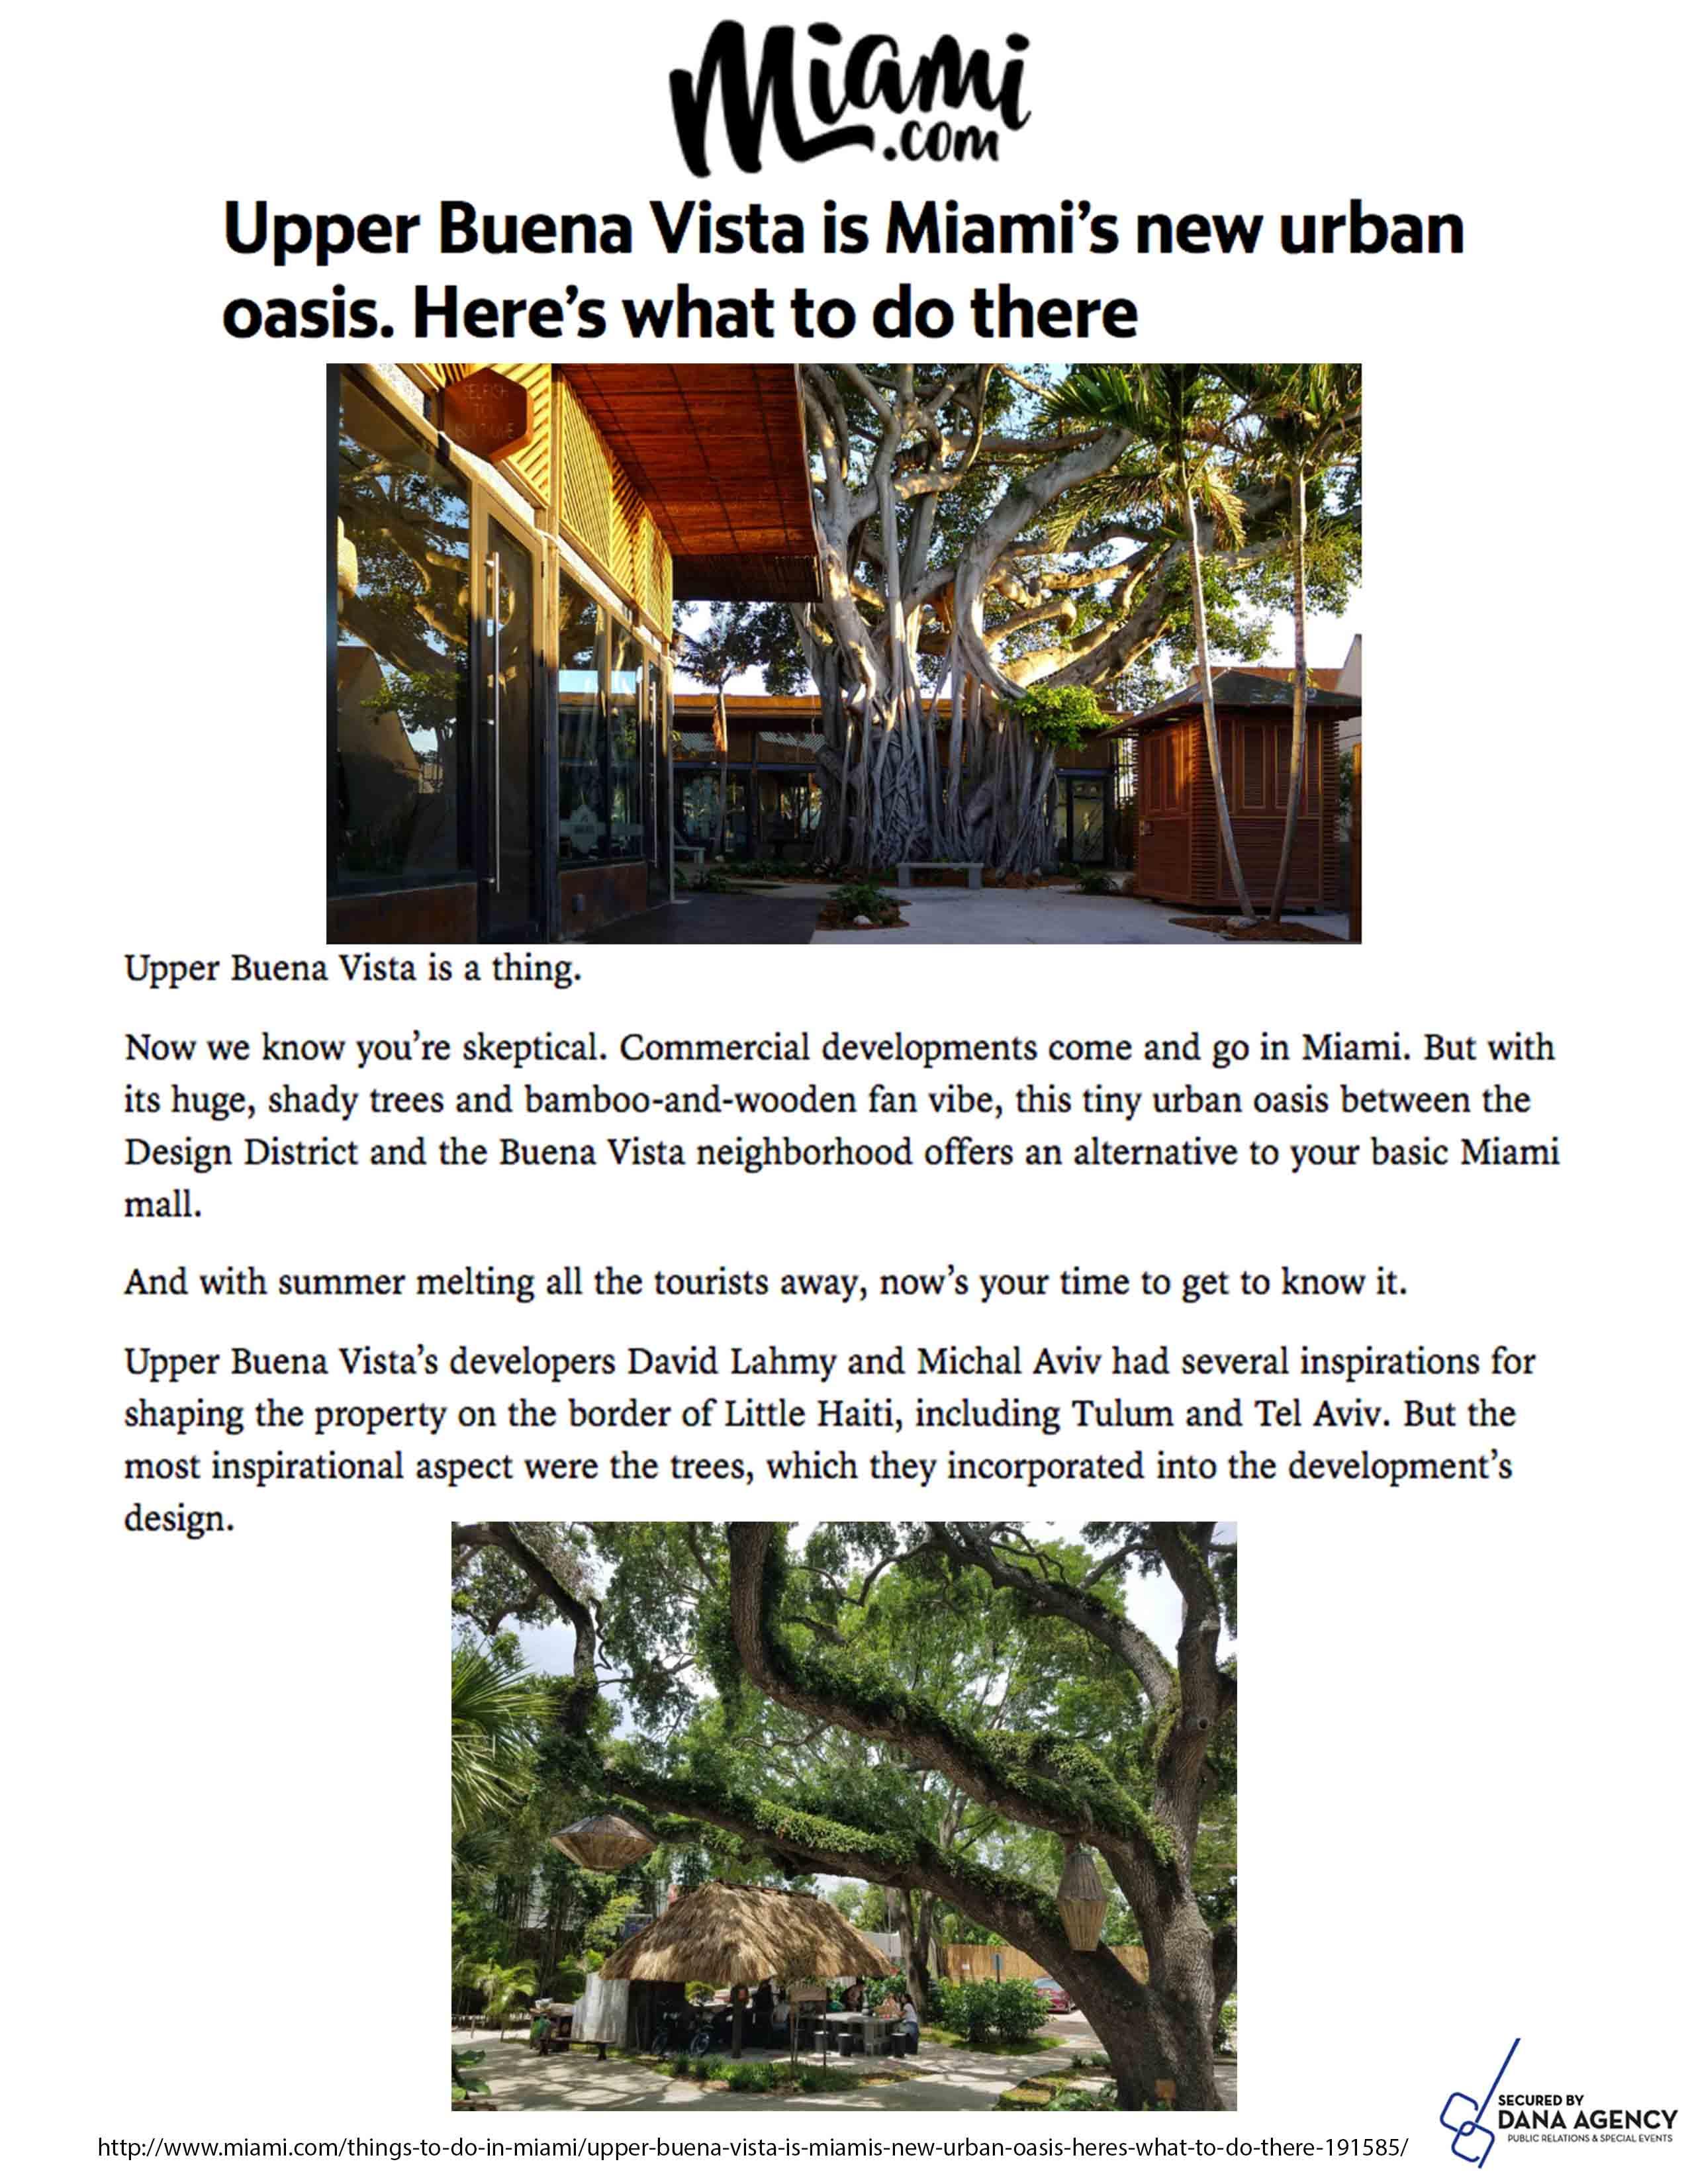 Miami.com_6.20.18_Online_Page1